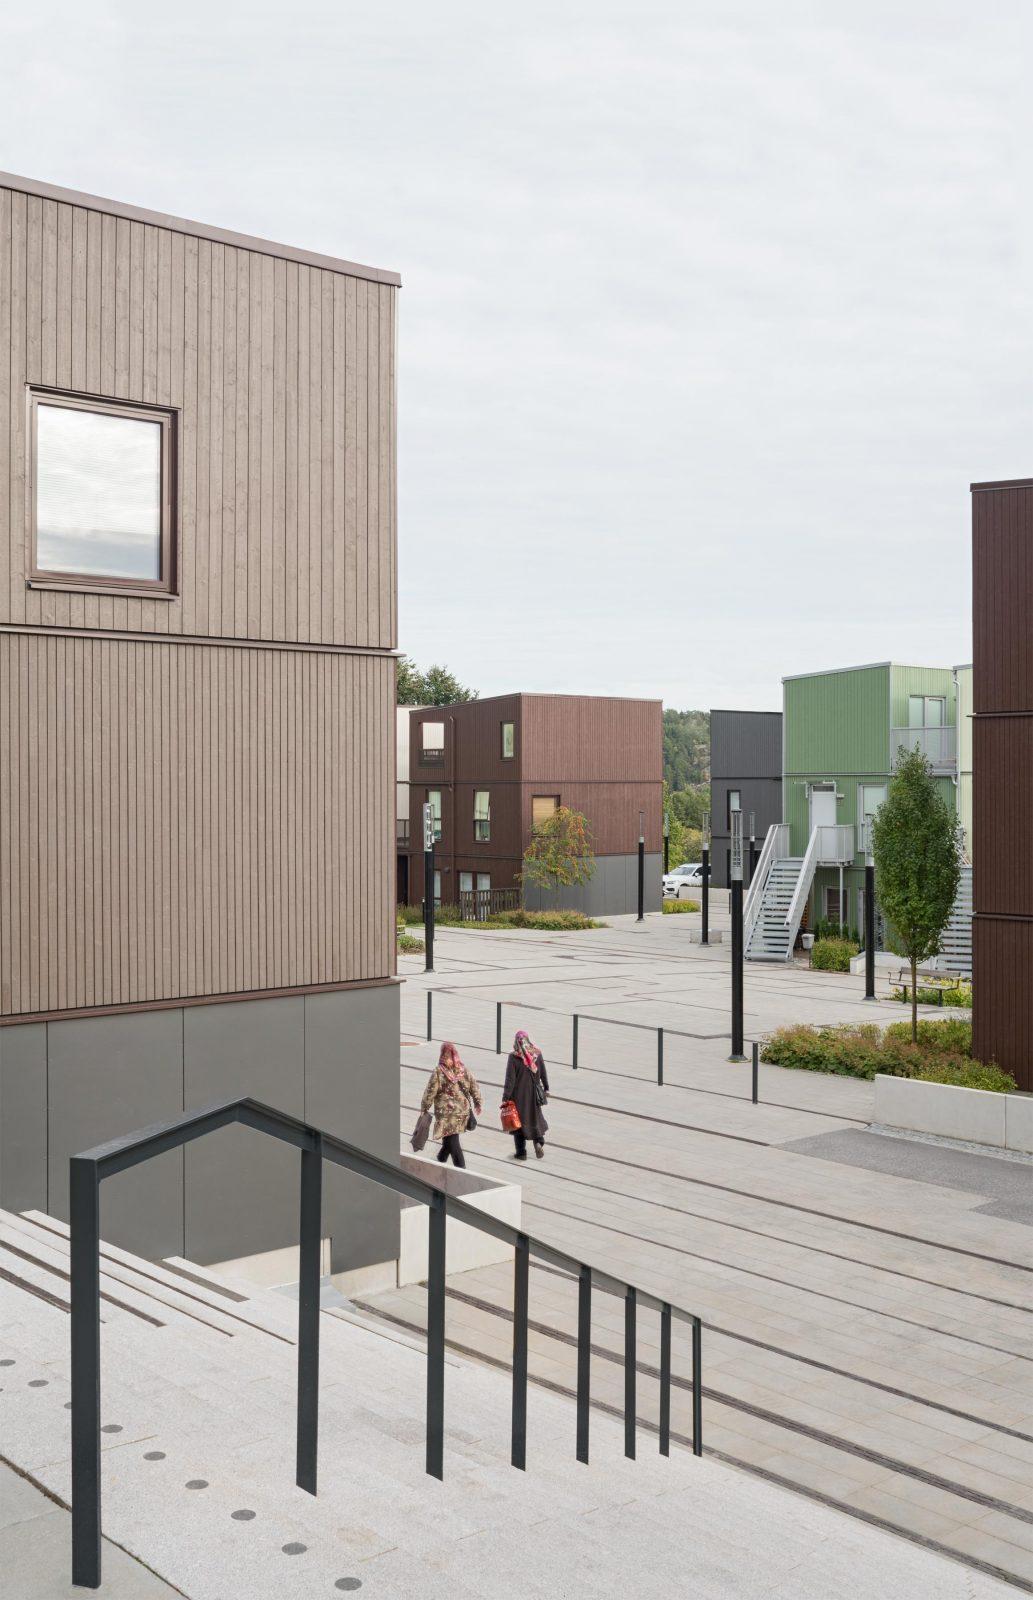 kjellandersjoberg fittjaterrassen square02